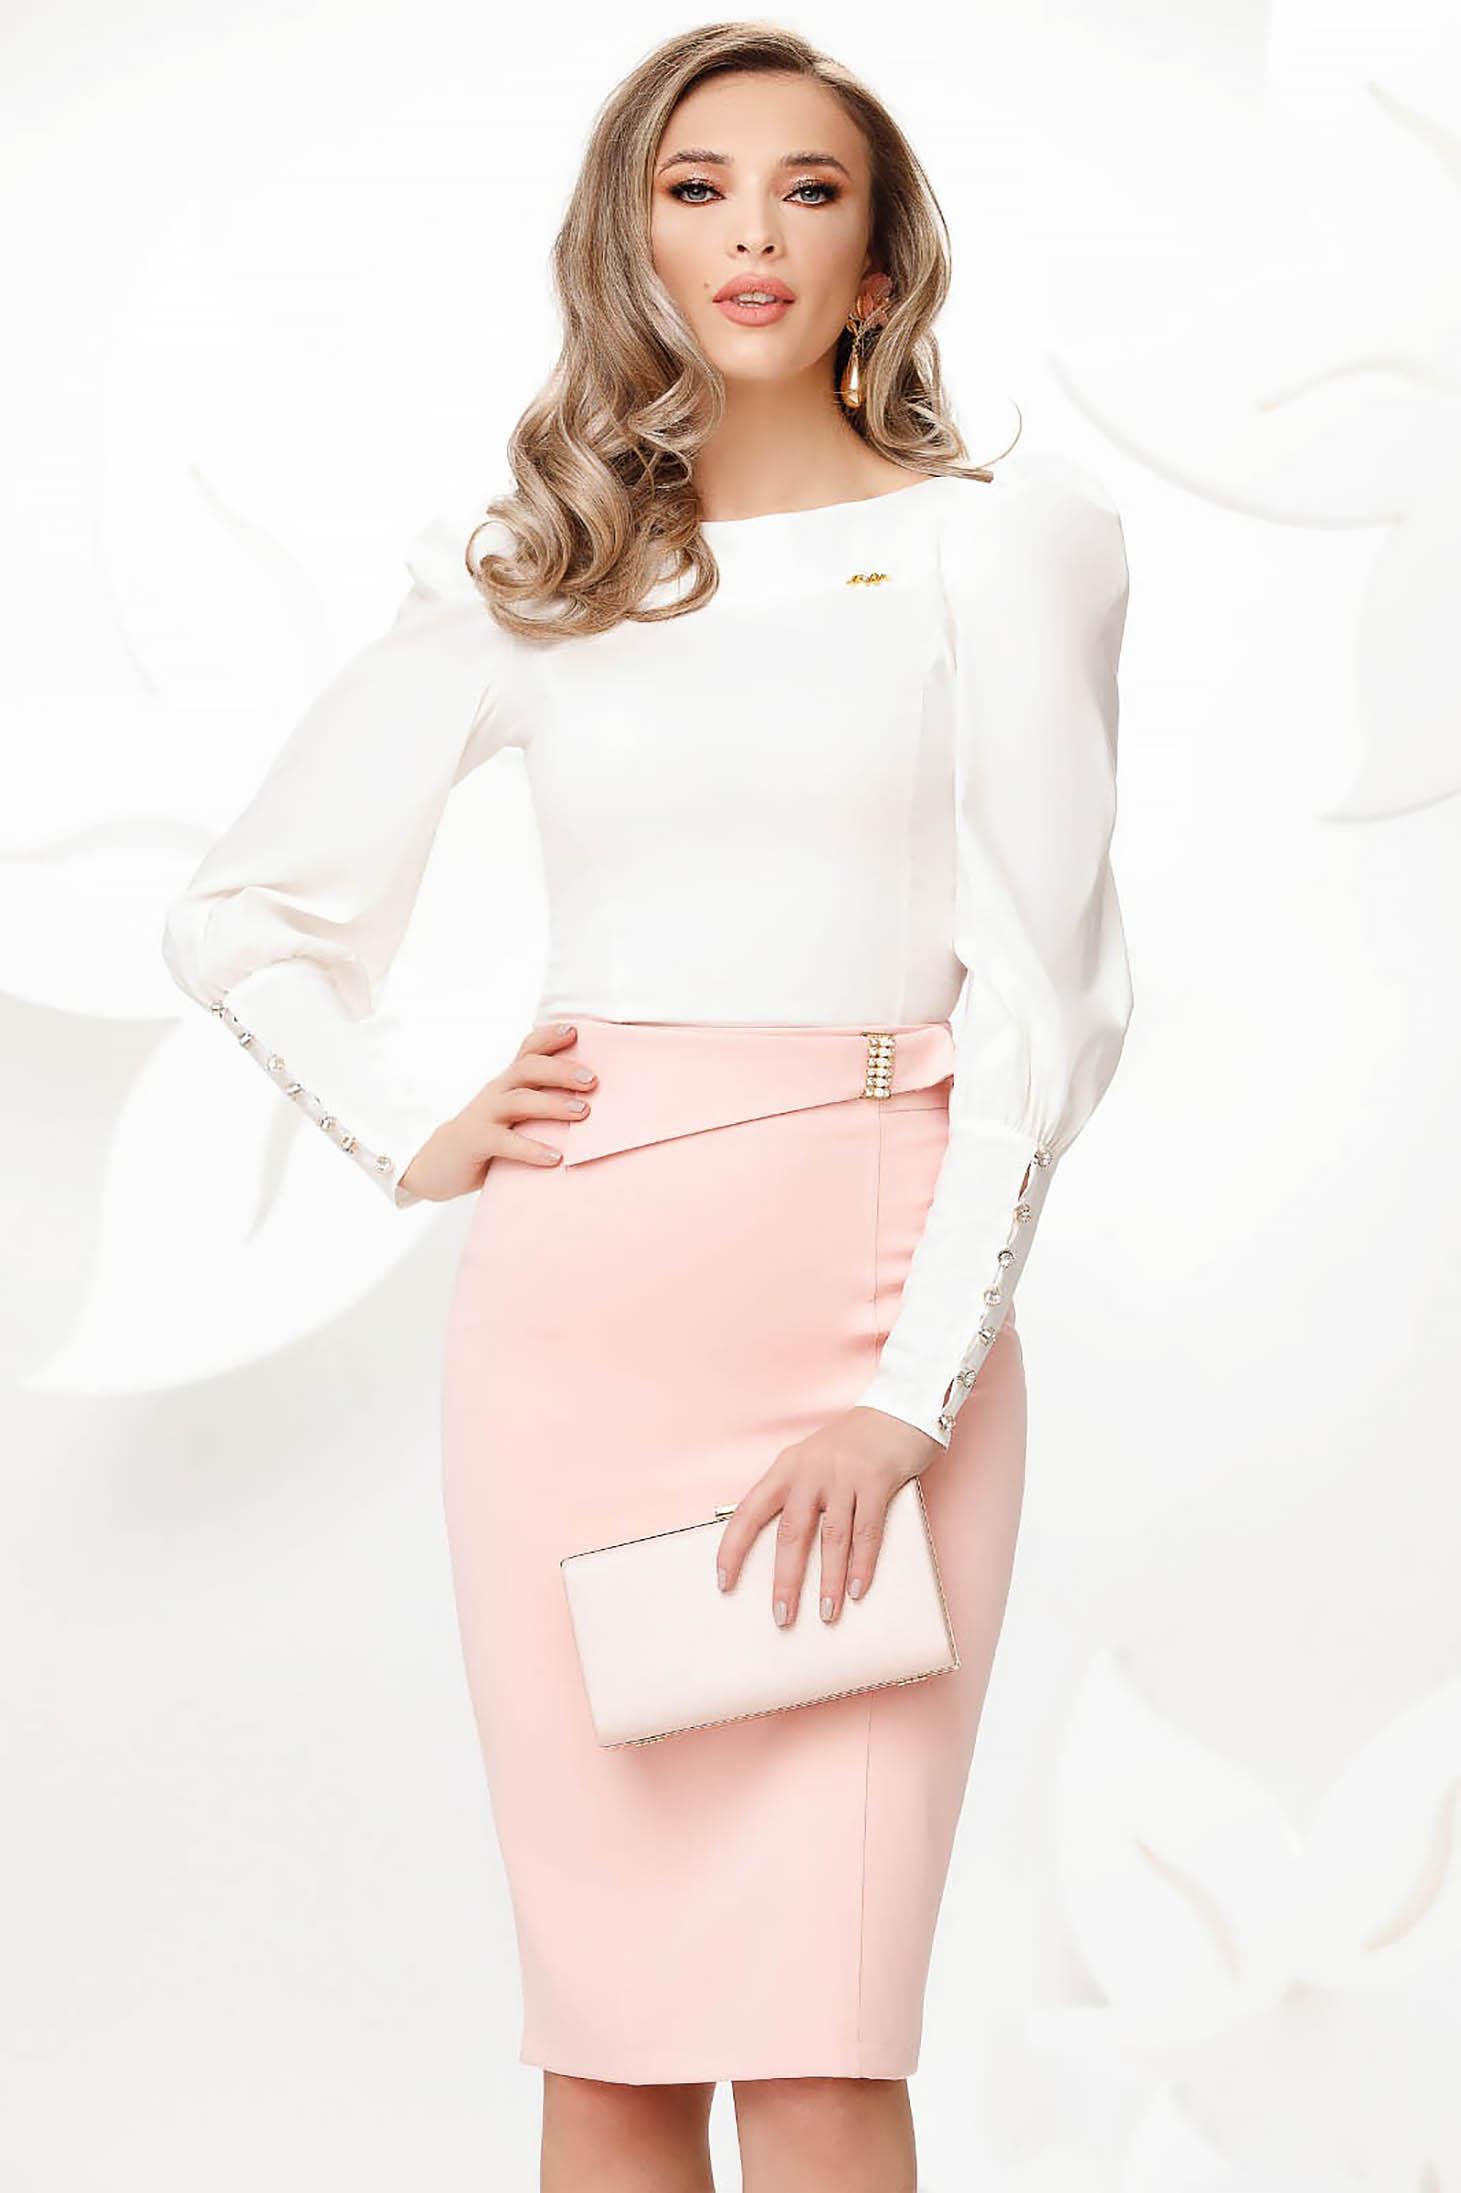 Fusta Fofy roz deschis eleganta din bumbac usor elastic tip creion accesorizata cu catarama cu perle